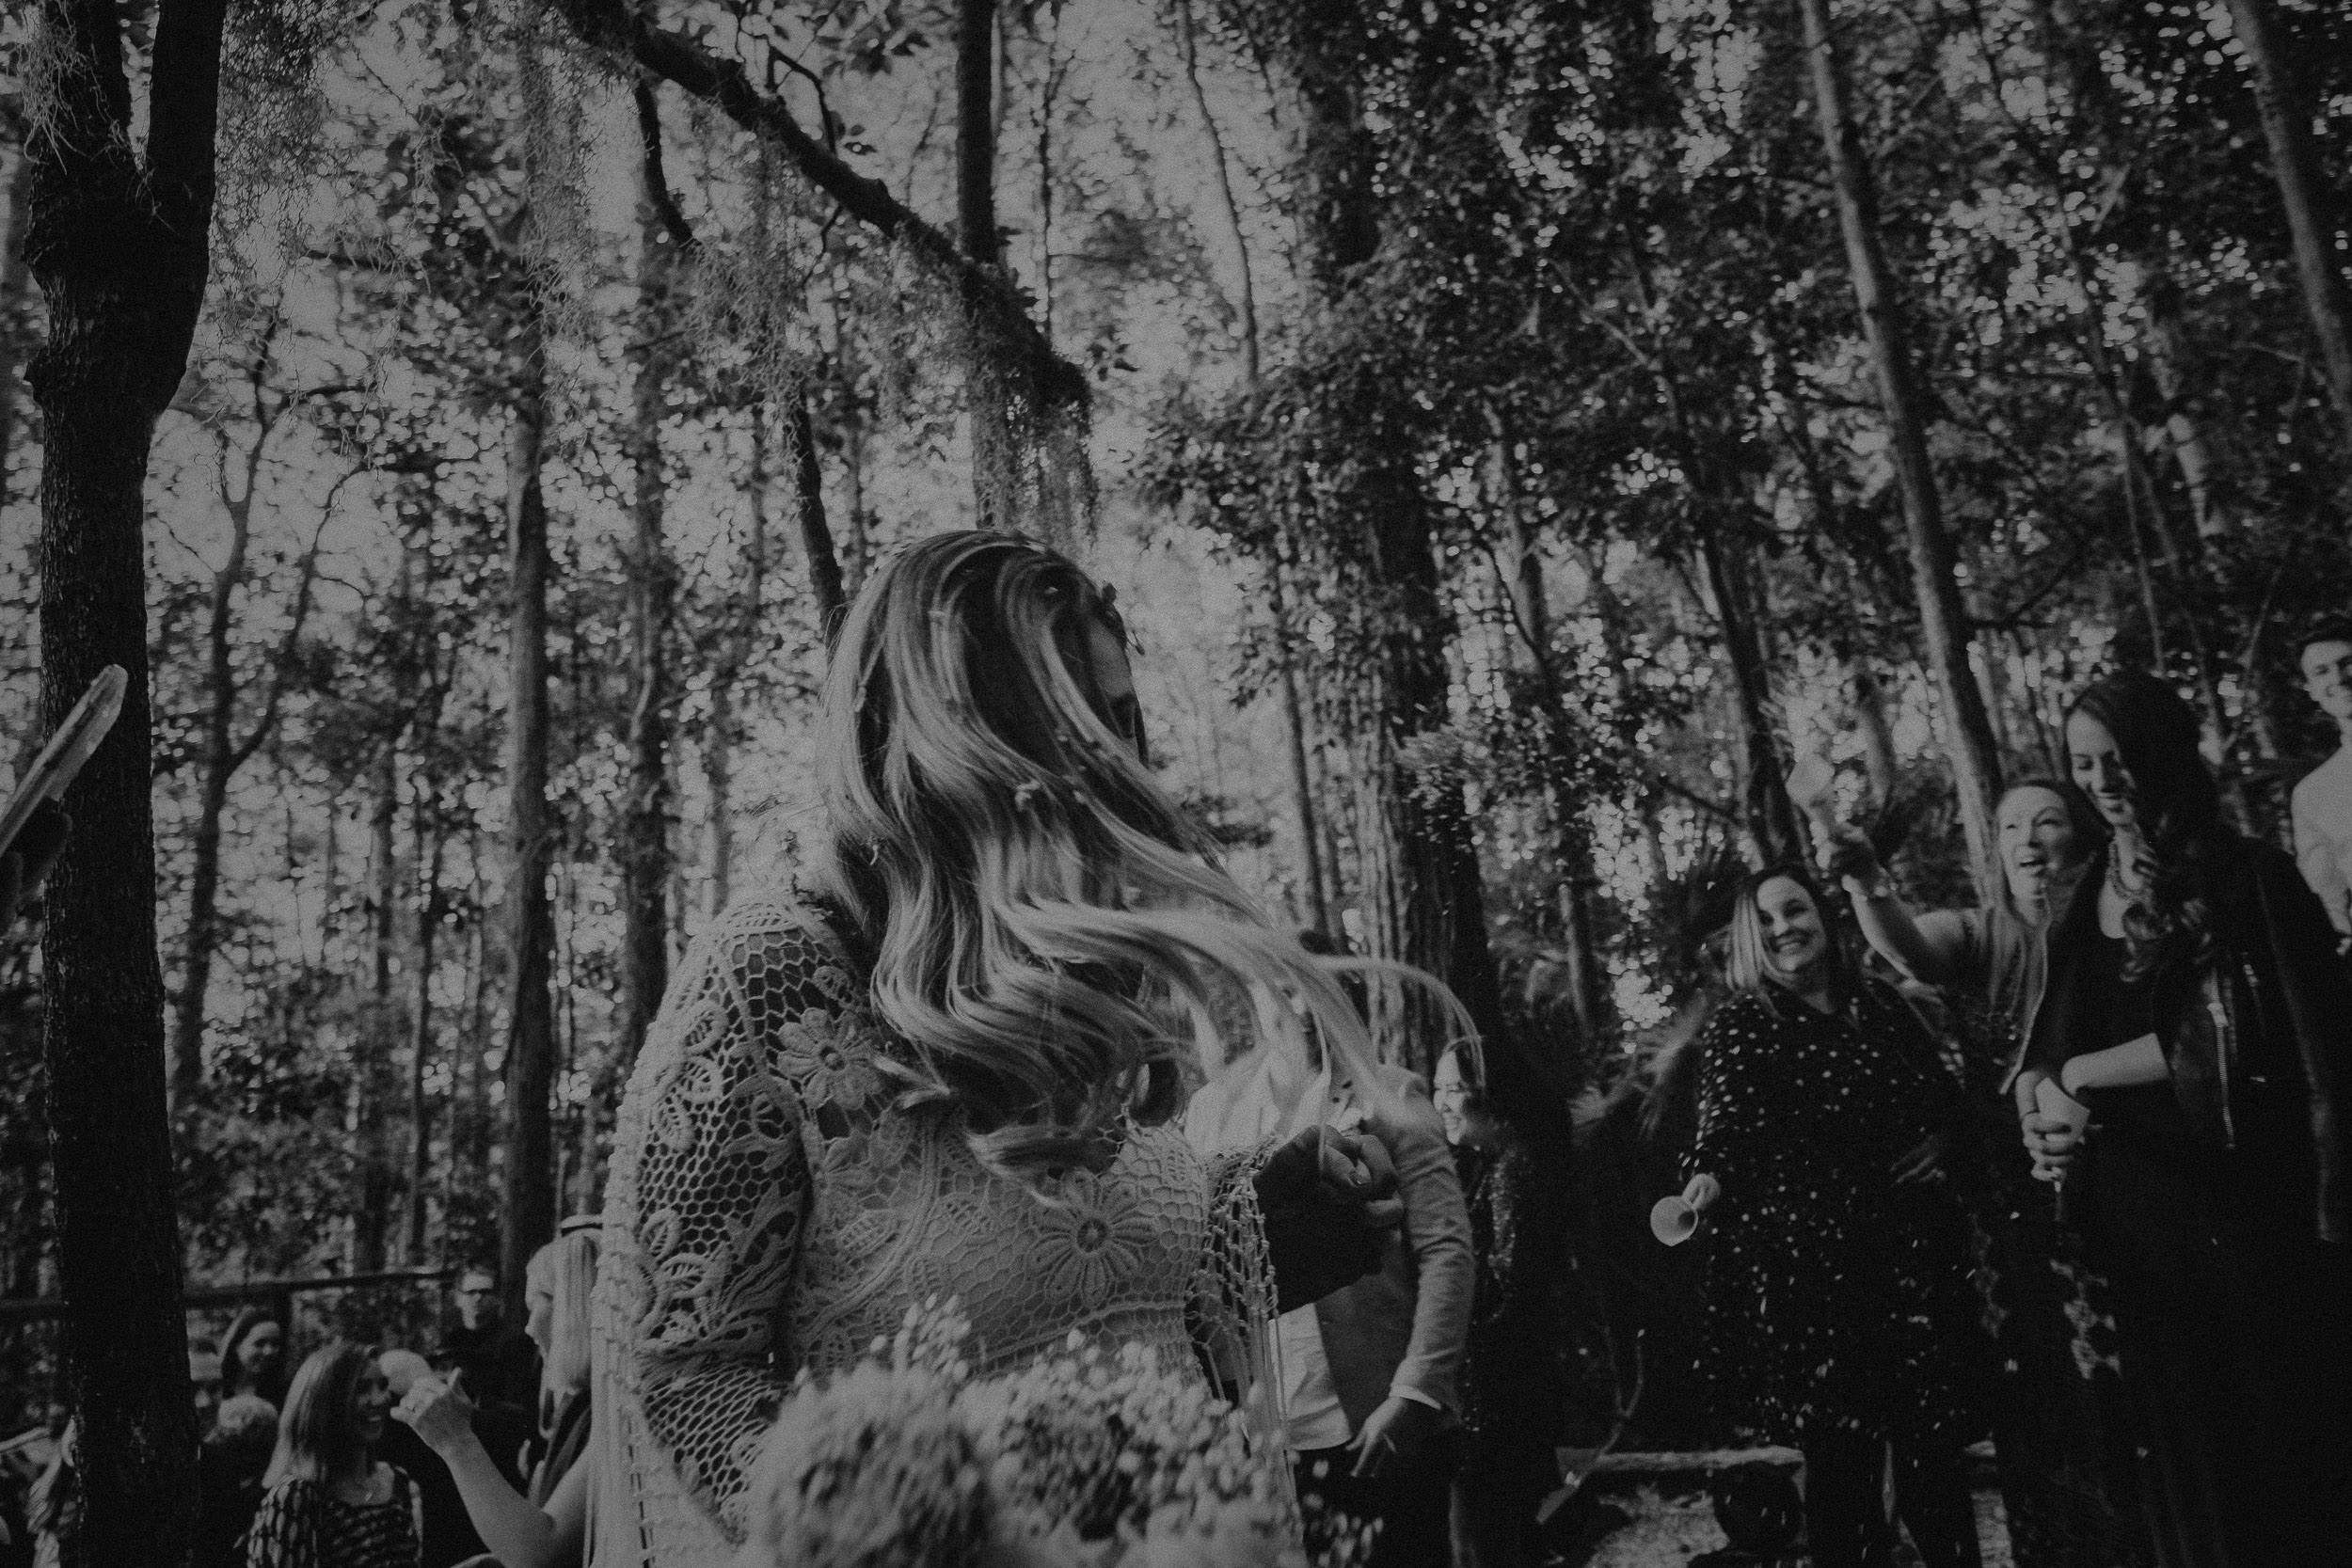 S&A Elopement - Kings & Thieves - Shred 'Til Dead - Central Coast Beach Forest Wedding - 293.jpg